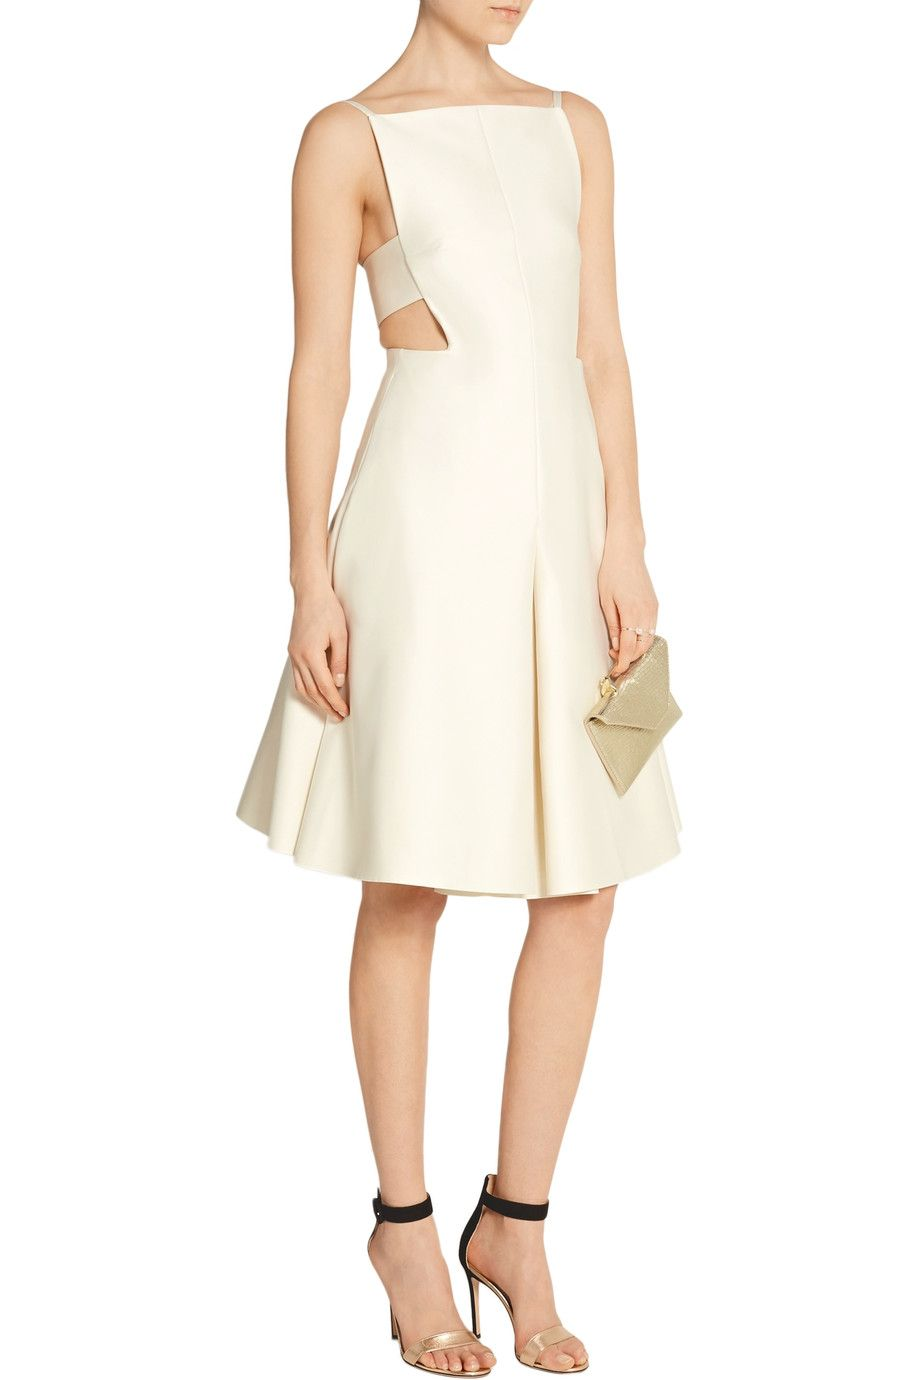 Solace London Ava cutout satin-crepe dress | THE OUTNET